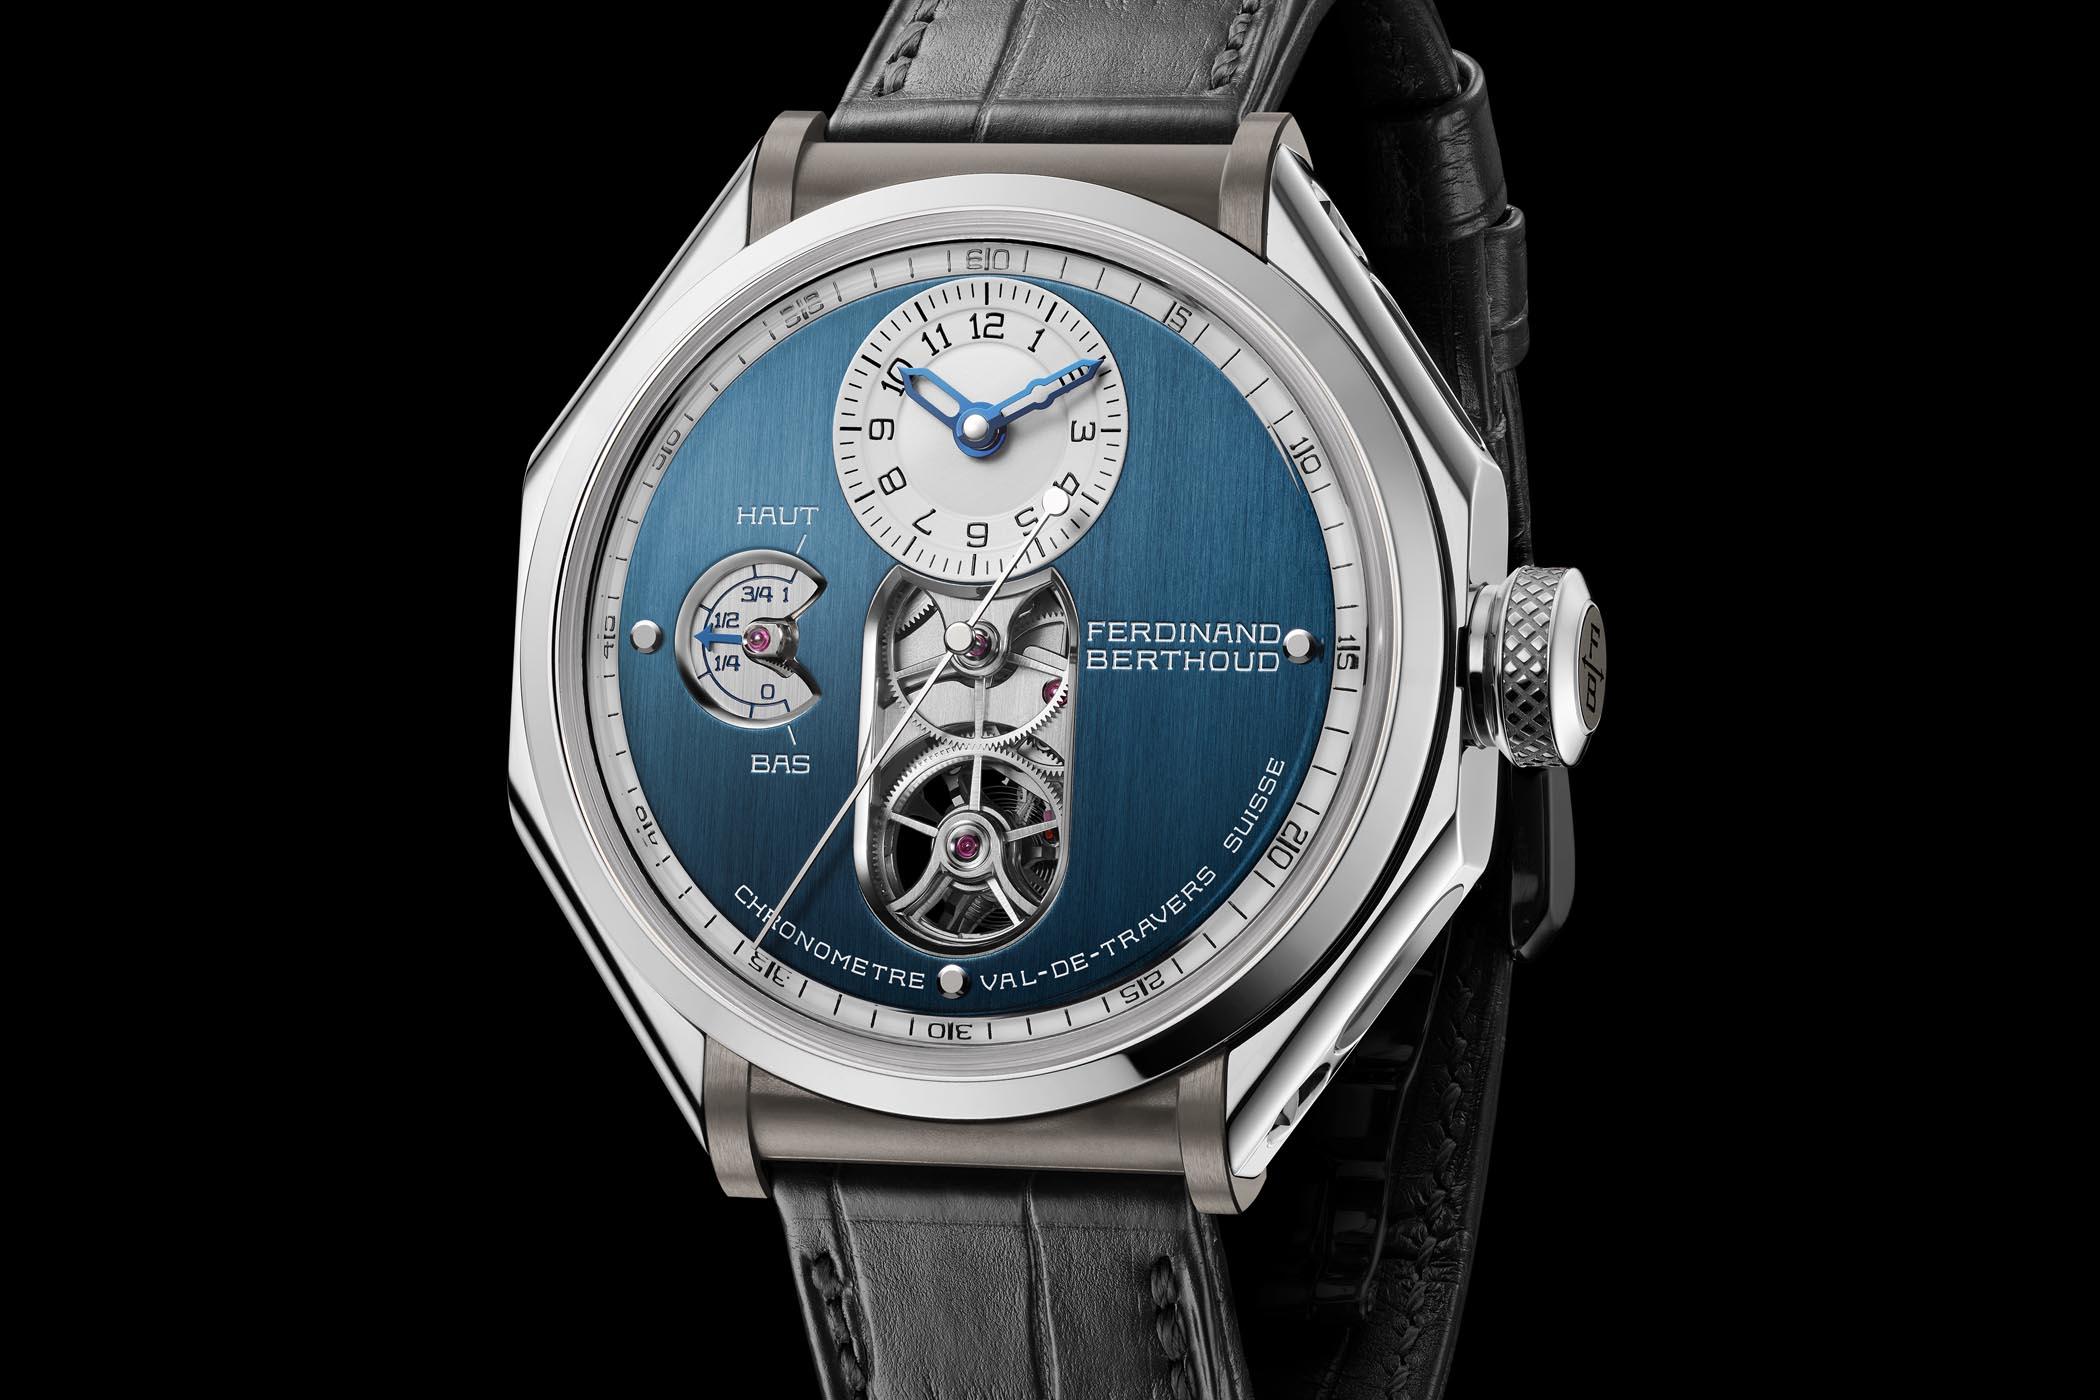 https://k8q7r7a2.stackpathcdn.com/wp-content/uploads/2019/11/Ferdinand-Berthoud-FB-1.3-1-Sapphire-Blue-Chronometer-4.jpg